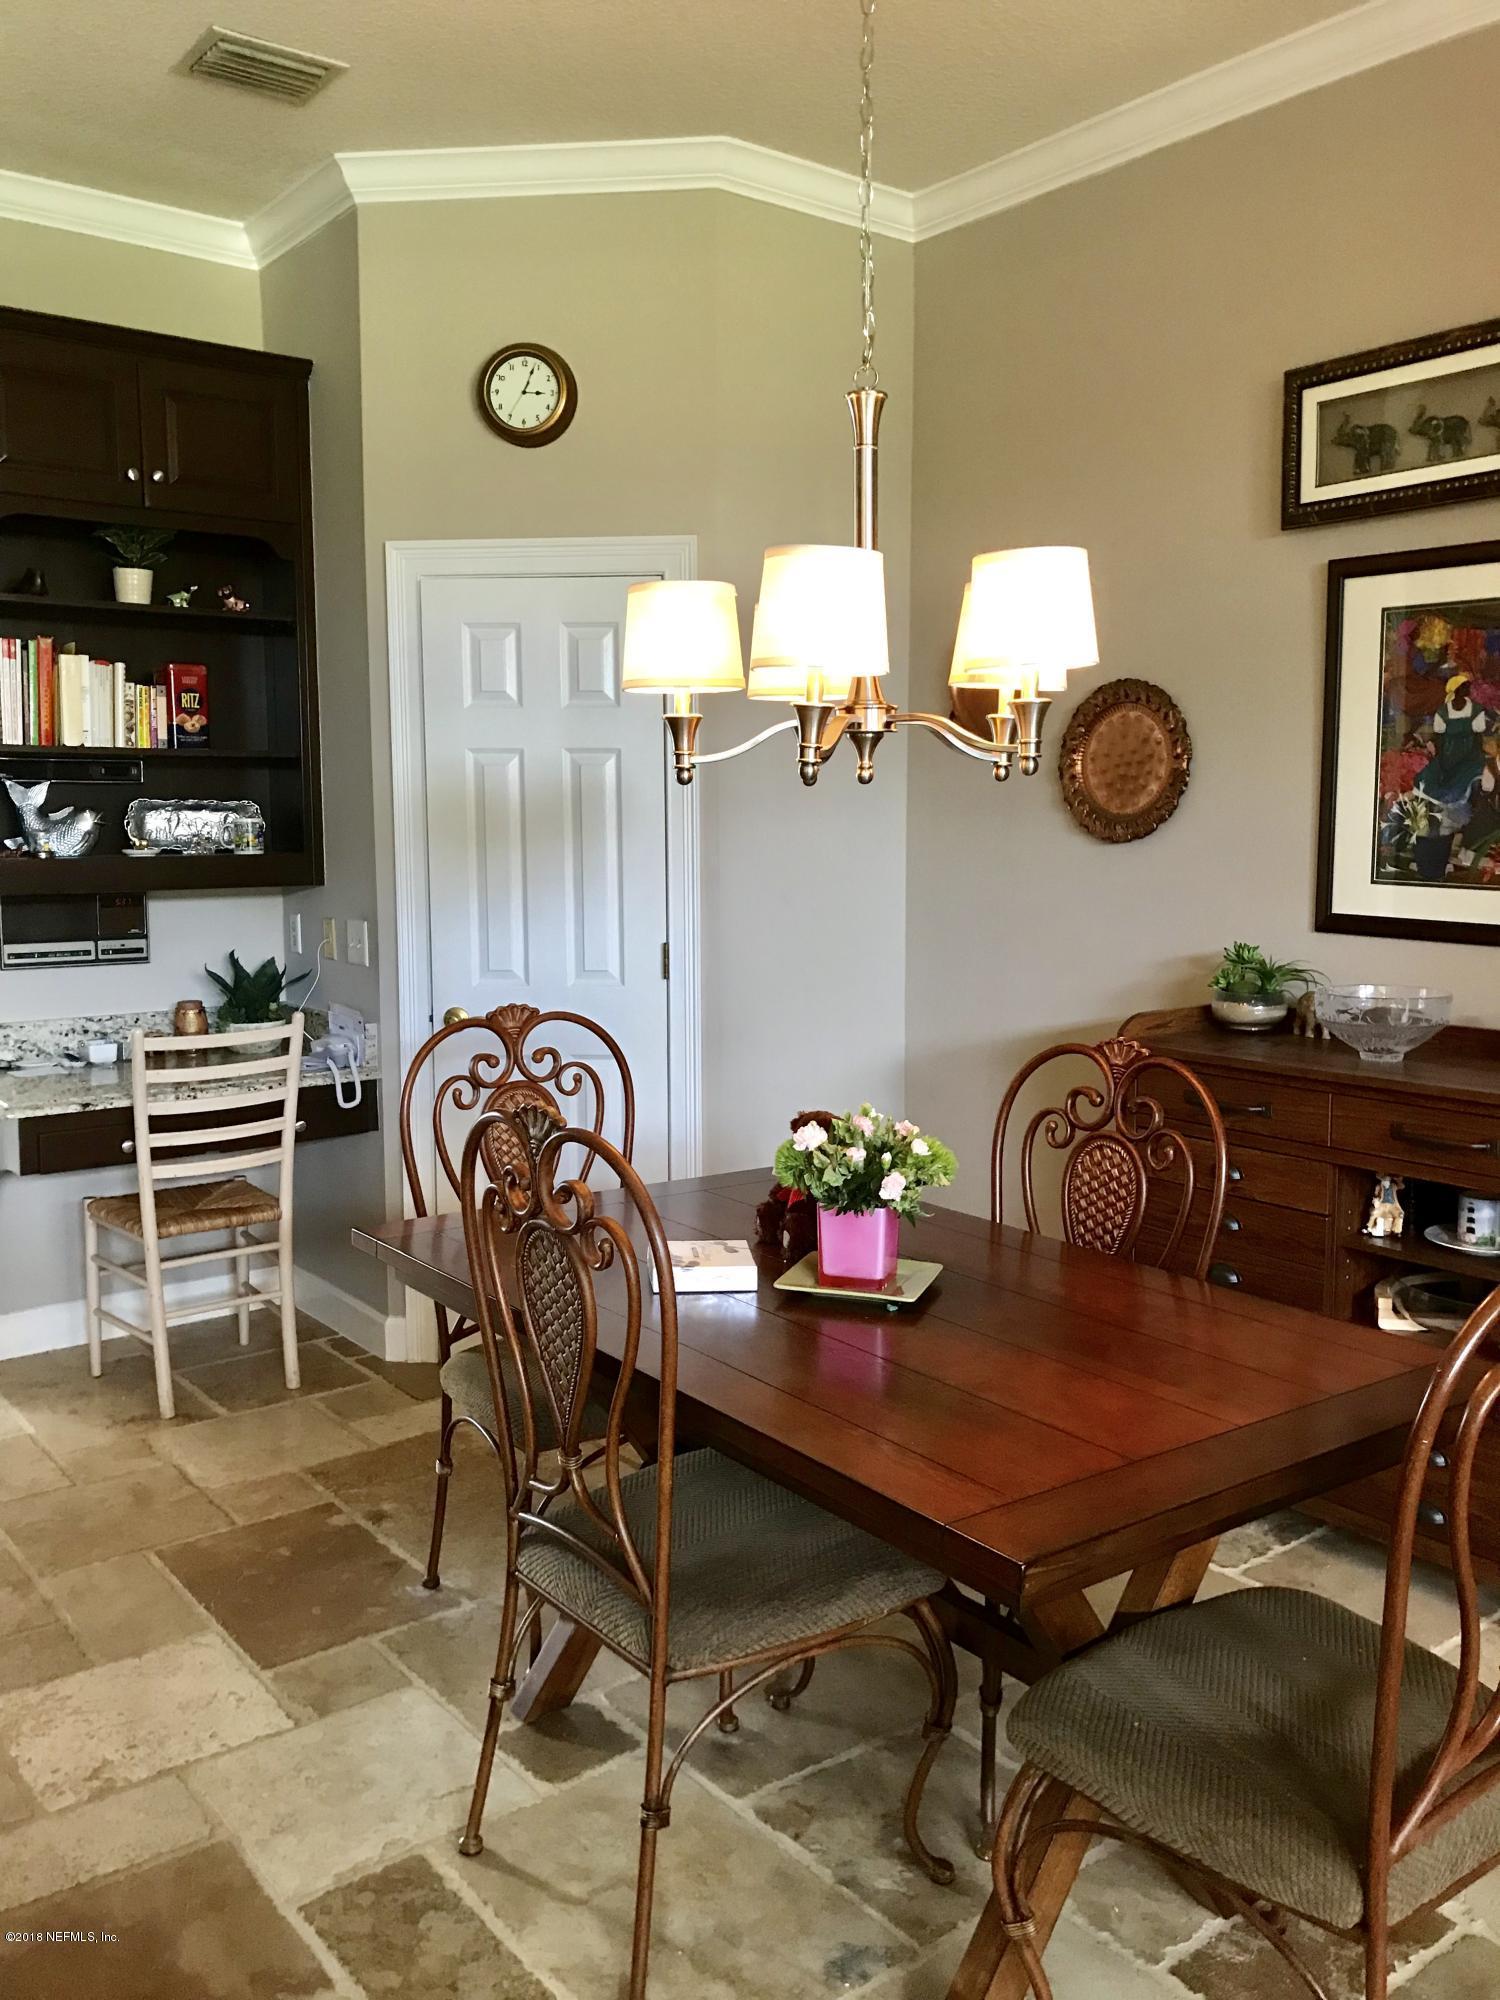 1161 SALT CREEK, PONTE VEDRA BEACH, FLORIDA 32082, 4 Bedrooms Bedrooms, ,3 BathroomsBathrooms,Residential - single family,For sale,SALT CREEK,936023